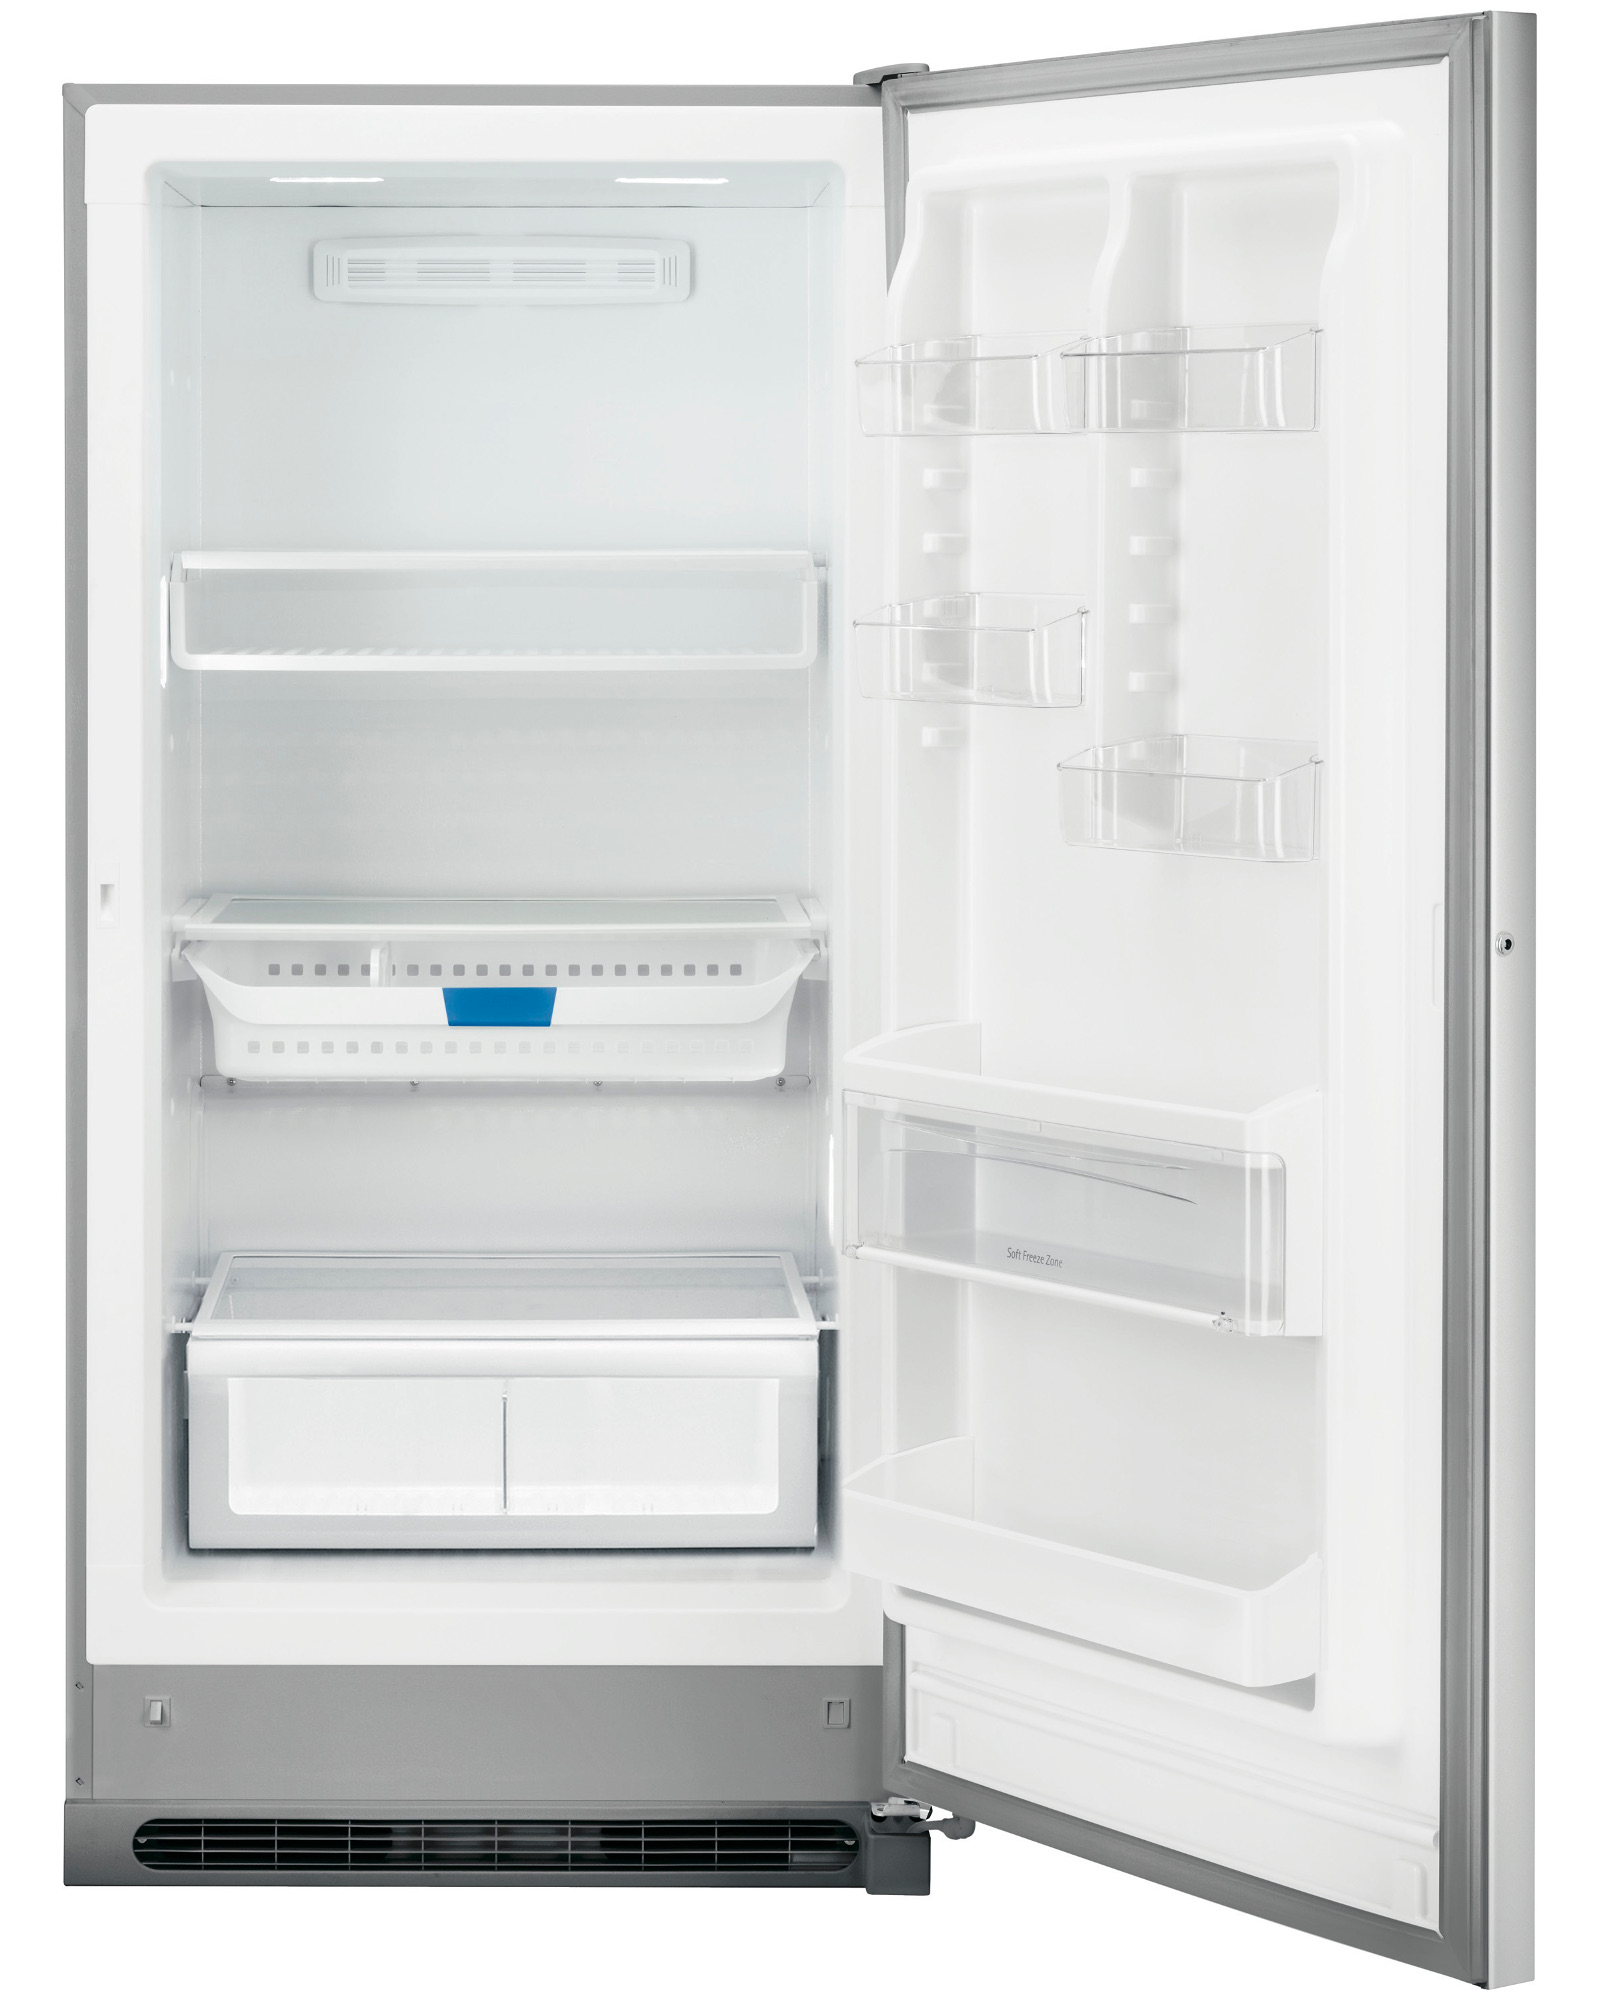 Frigidaire FGVU21F8QF 20.5 cu. ft. Convertible Refrigerator/Freezer - Stainless Steel